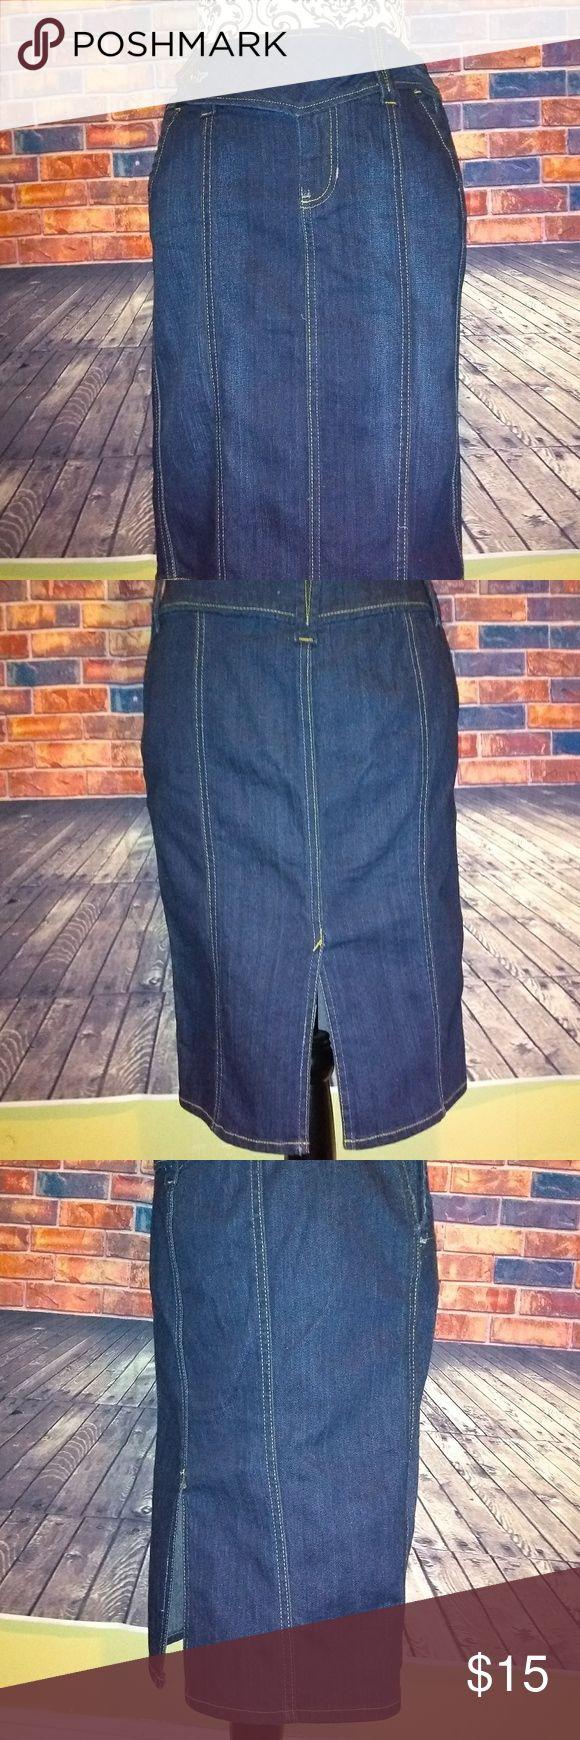 Gap jeans knee length skirt Gap Jeans denim stretch knee length skirt 99% cotton 1% Lycra. Size 2 waist is 32in length from waist to bottom is 22in. GAP Skirts Pencil